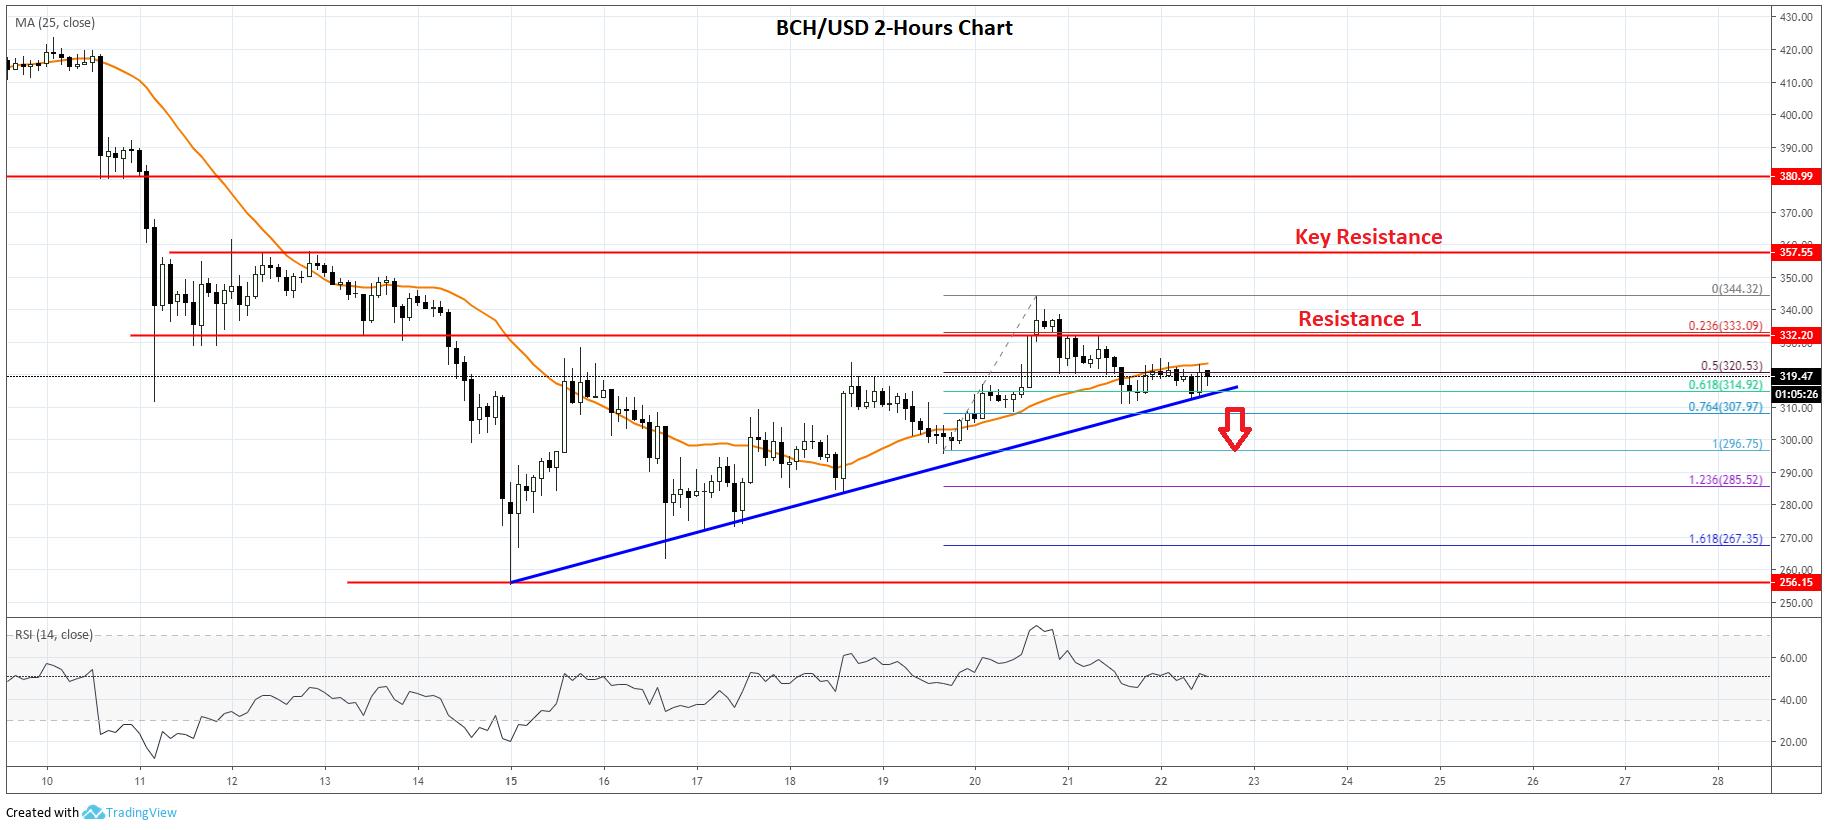 Bitcoin Cash (BCH) Remains At Risk Of Downside Break Below $300